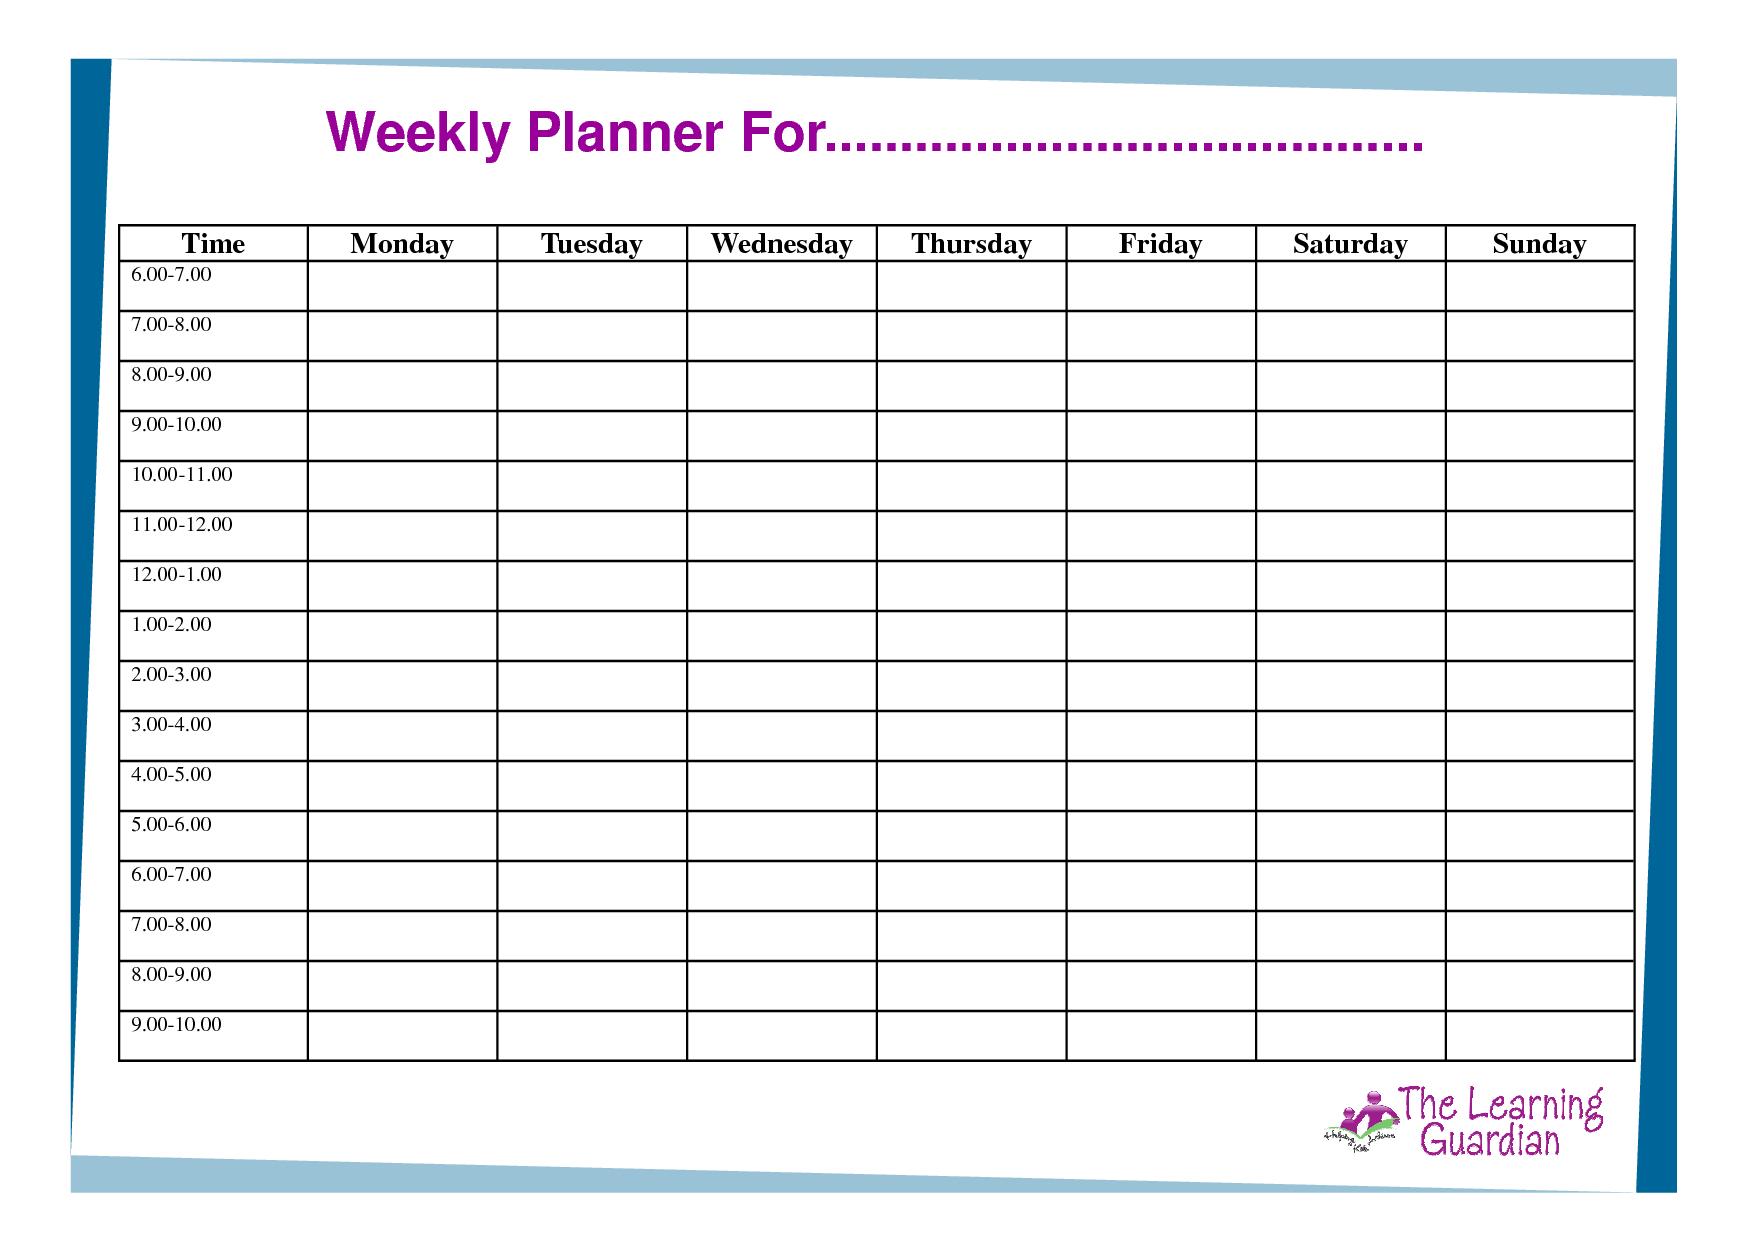 Free+Printable+Weekly+Planner+Templates In 2020 (With Images One Week Printable Calnedar